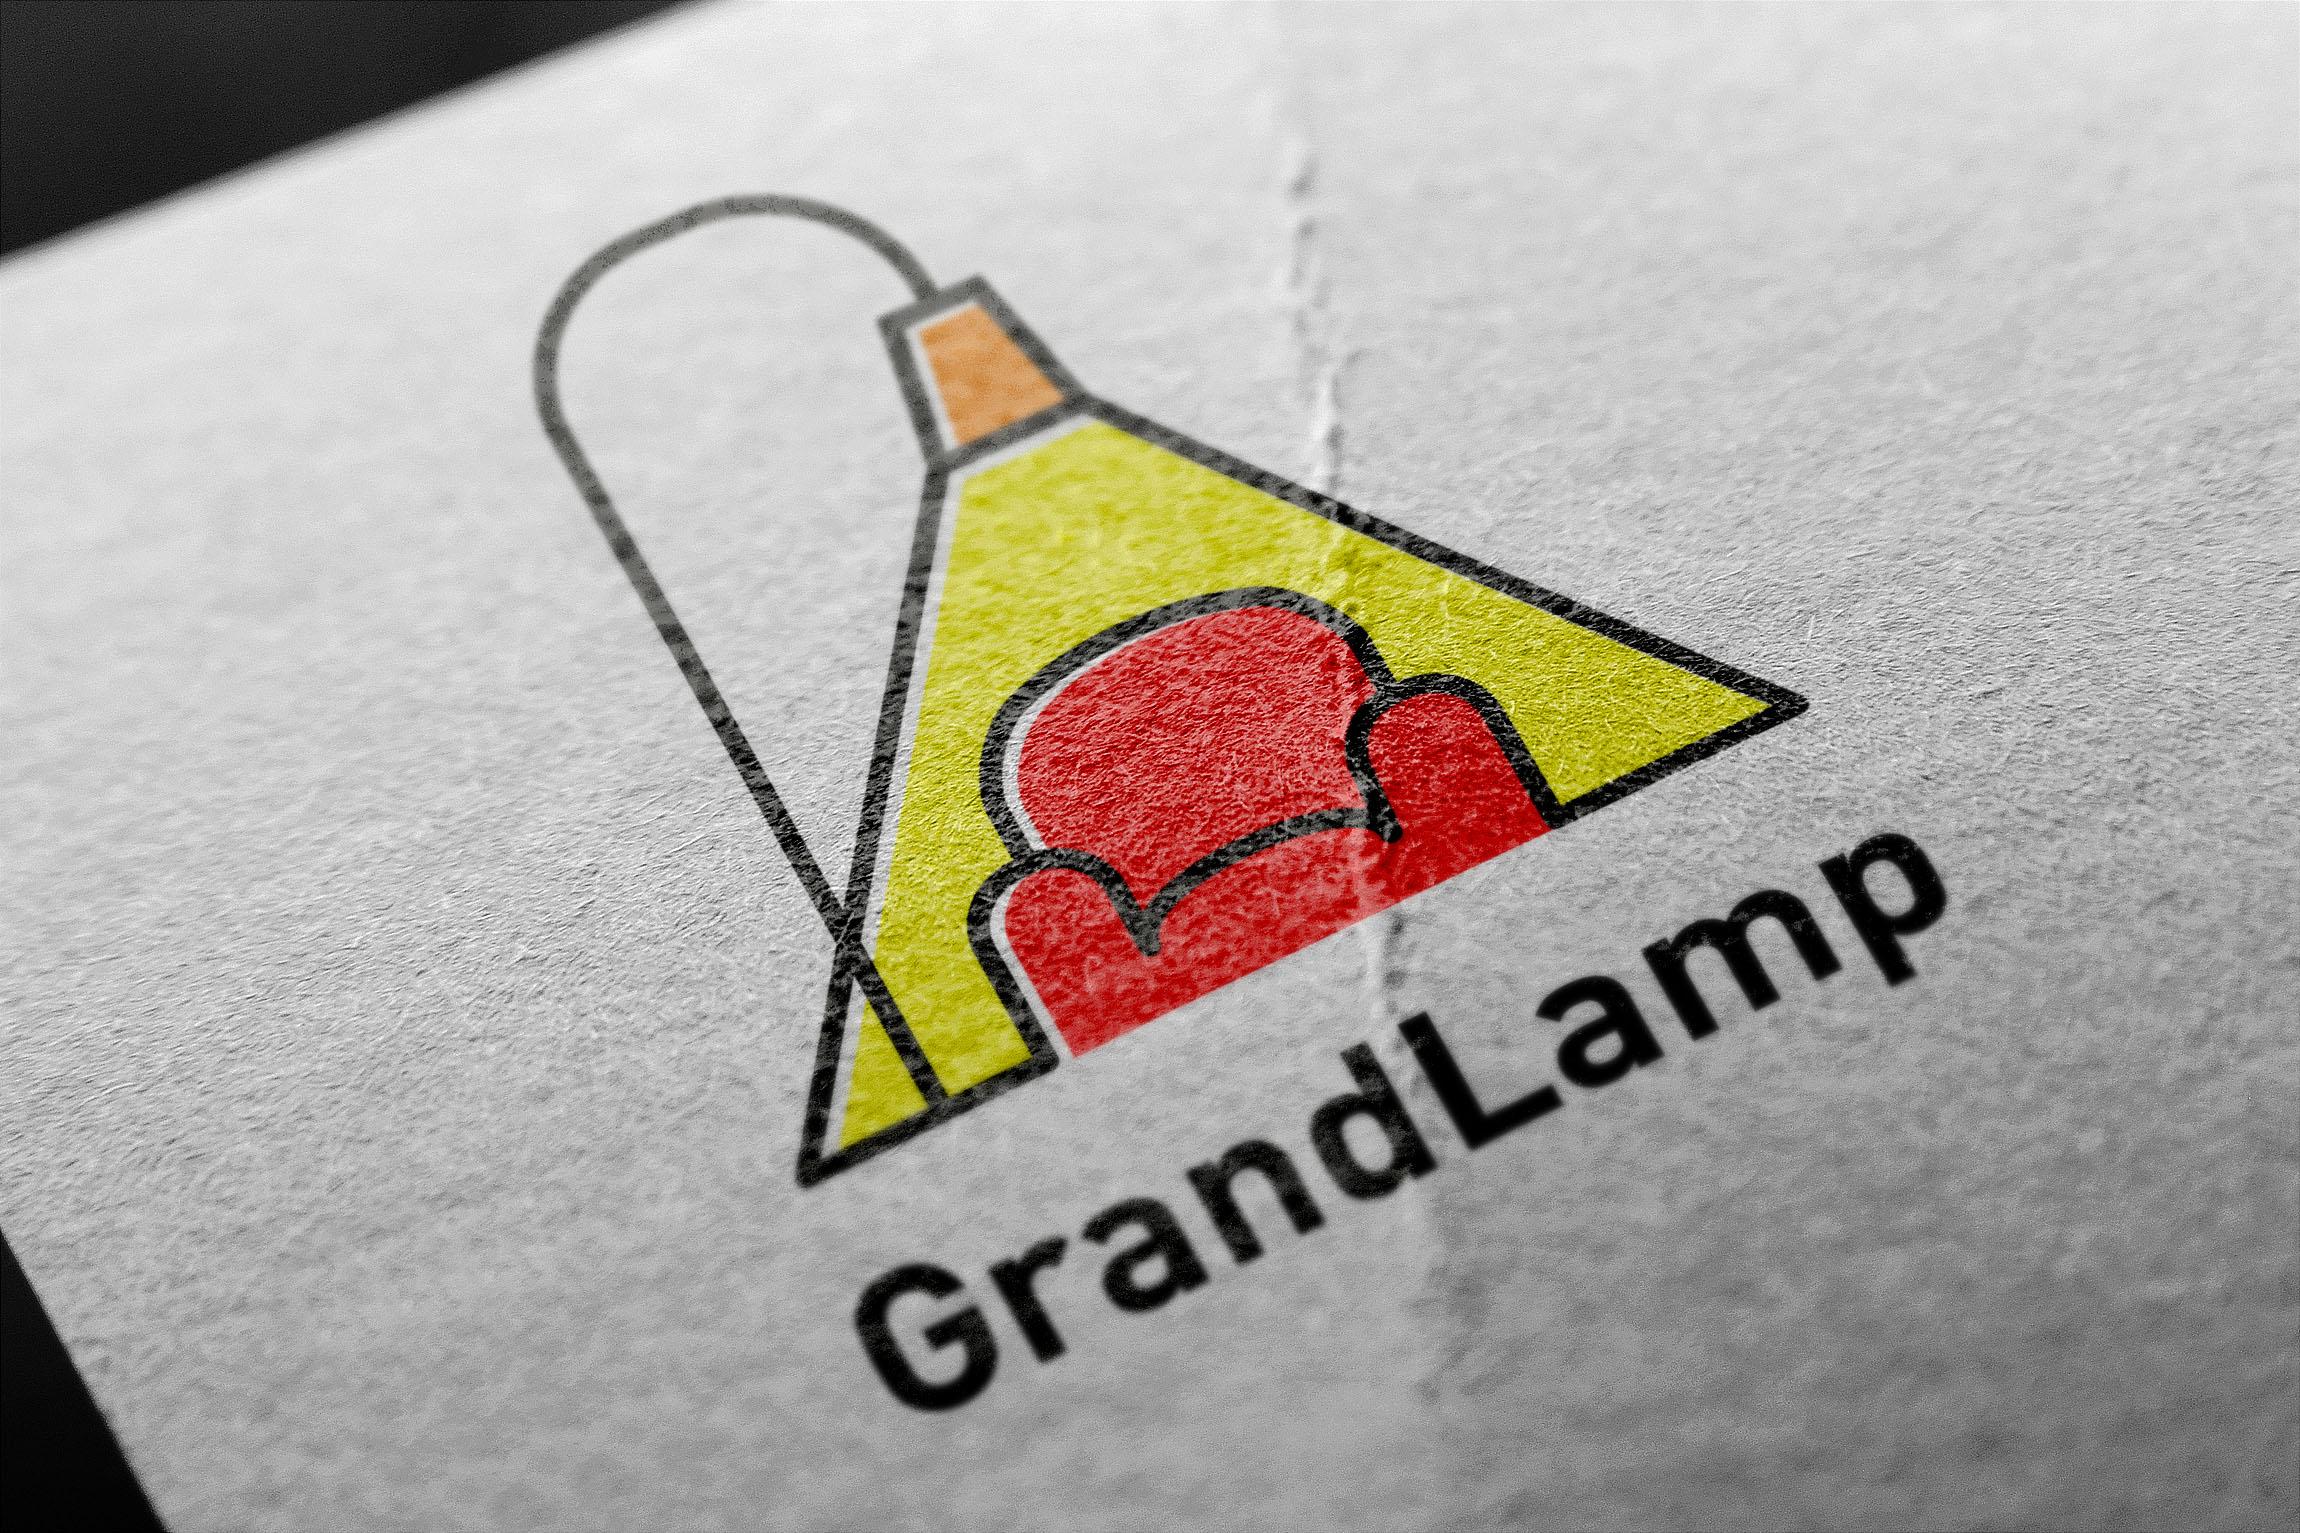 Разработка логотипа и элементов фирменного стиля фото f_27357df078b09771.jpg